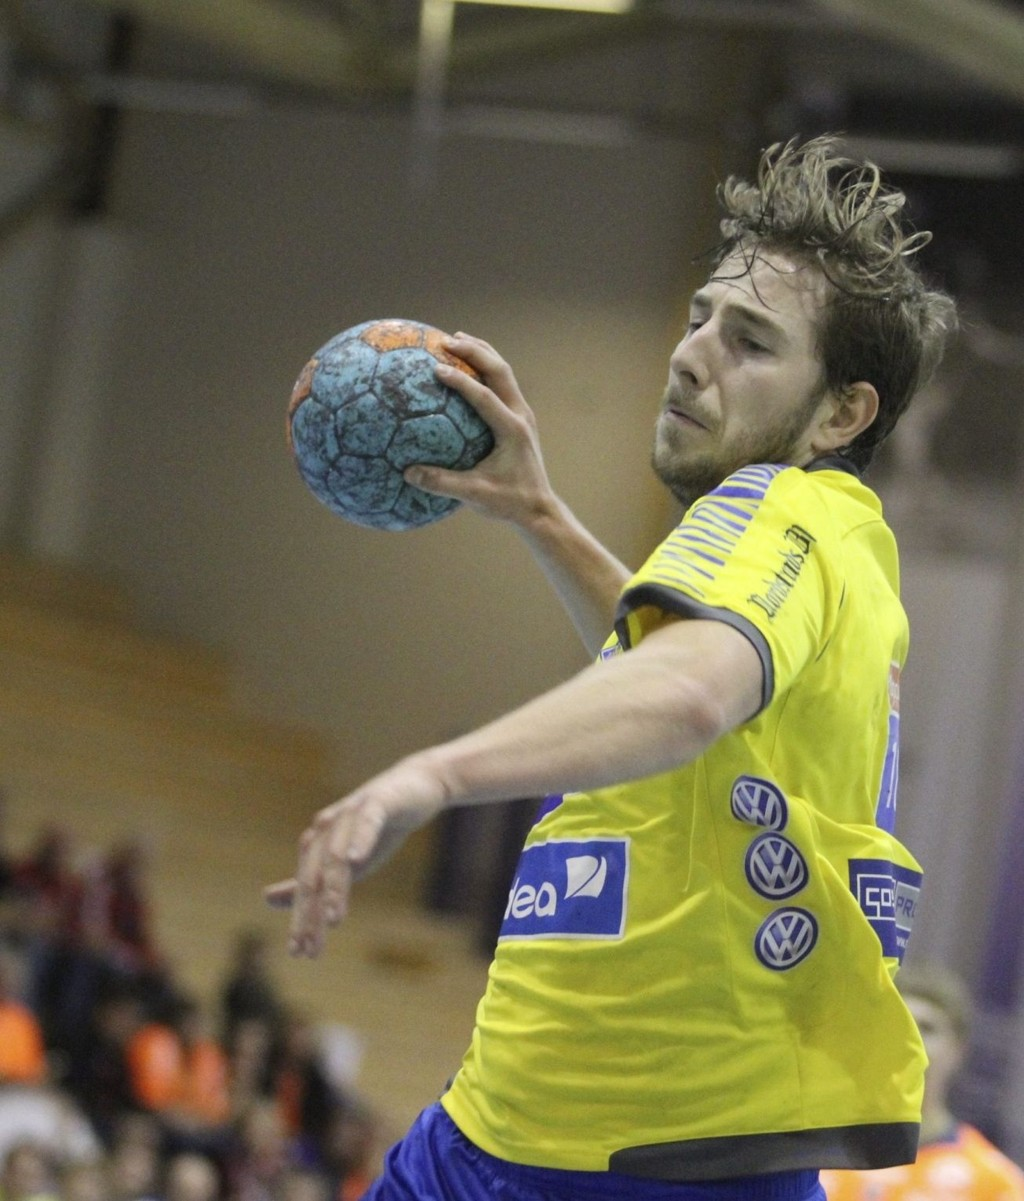 Til Tyskland: Stian Brevik spilte ikke siste hjemmekamp.